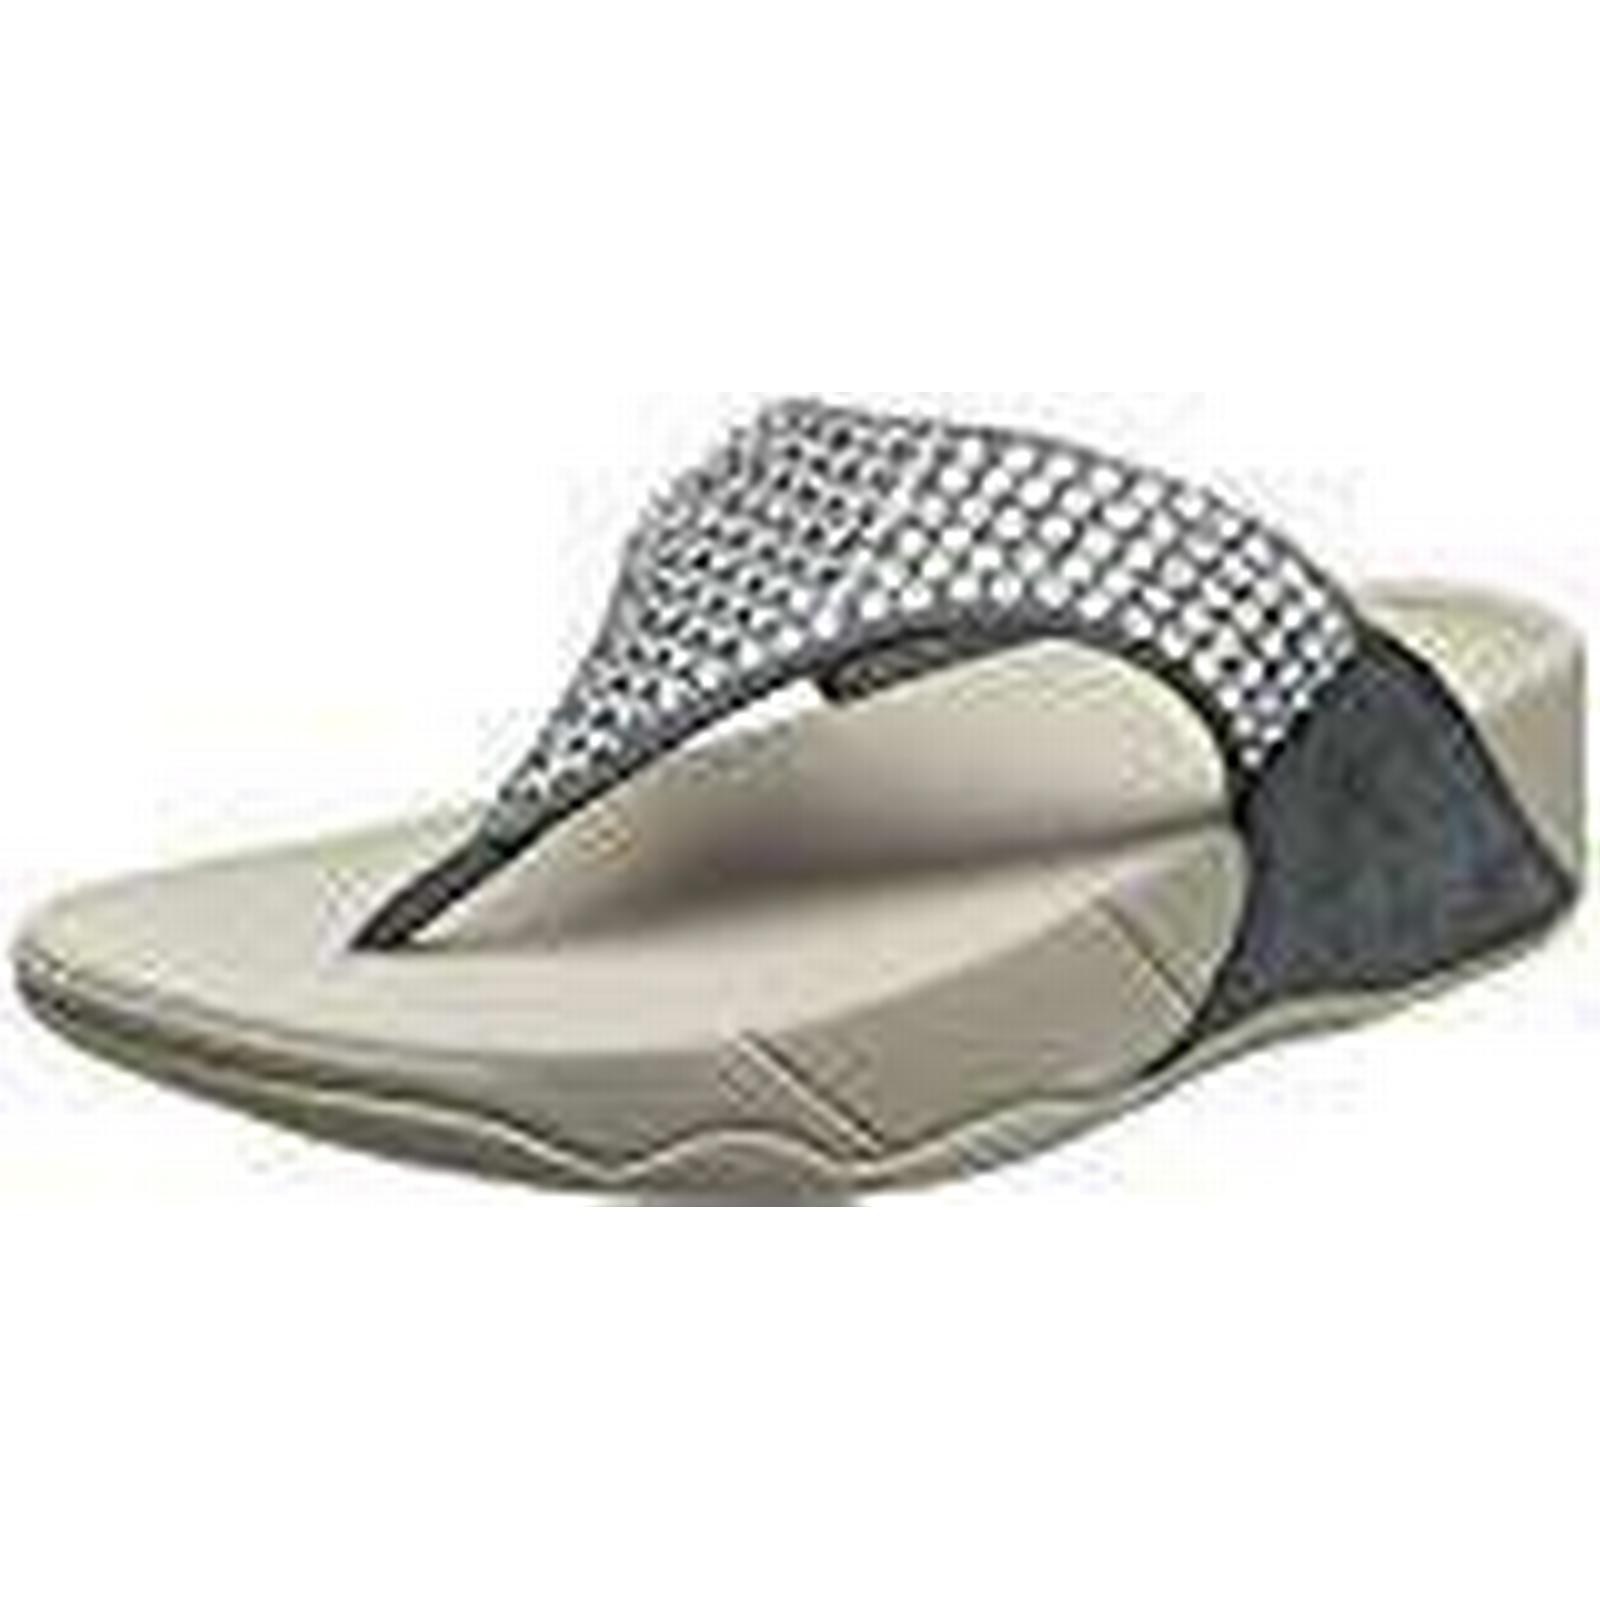 Fitflop Women's Glitzie Thong Heels 7 Sandals, Blue (Dove Blue), 7 Heels UK (41 EU) b129f1